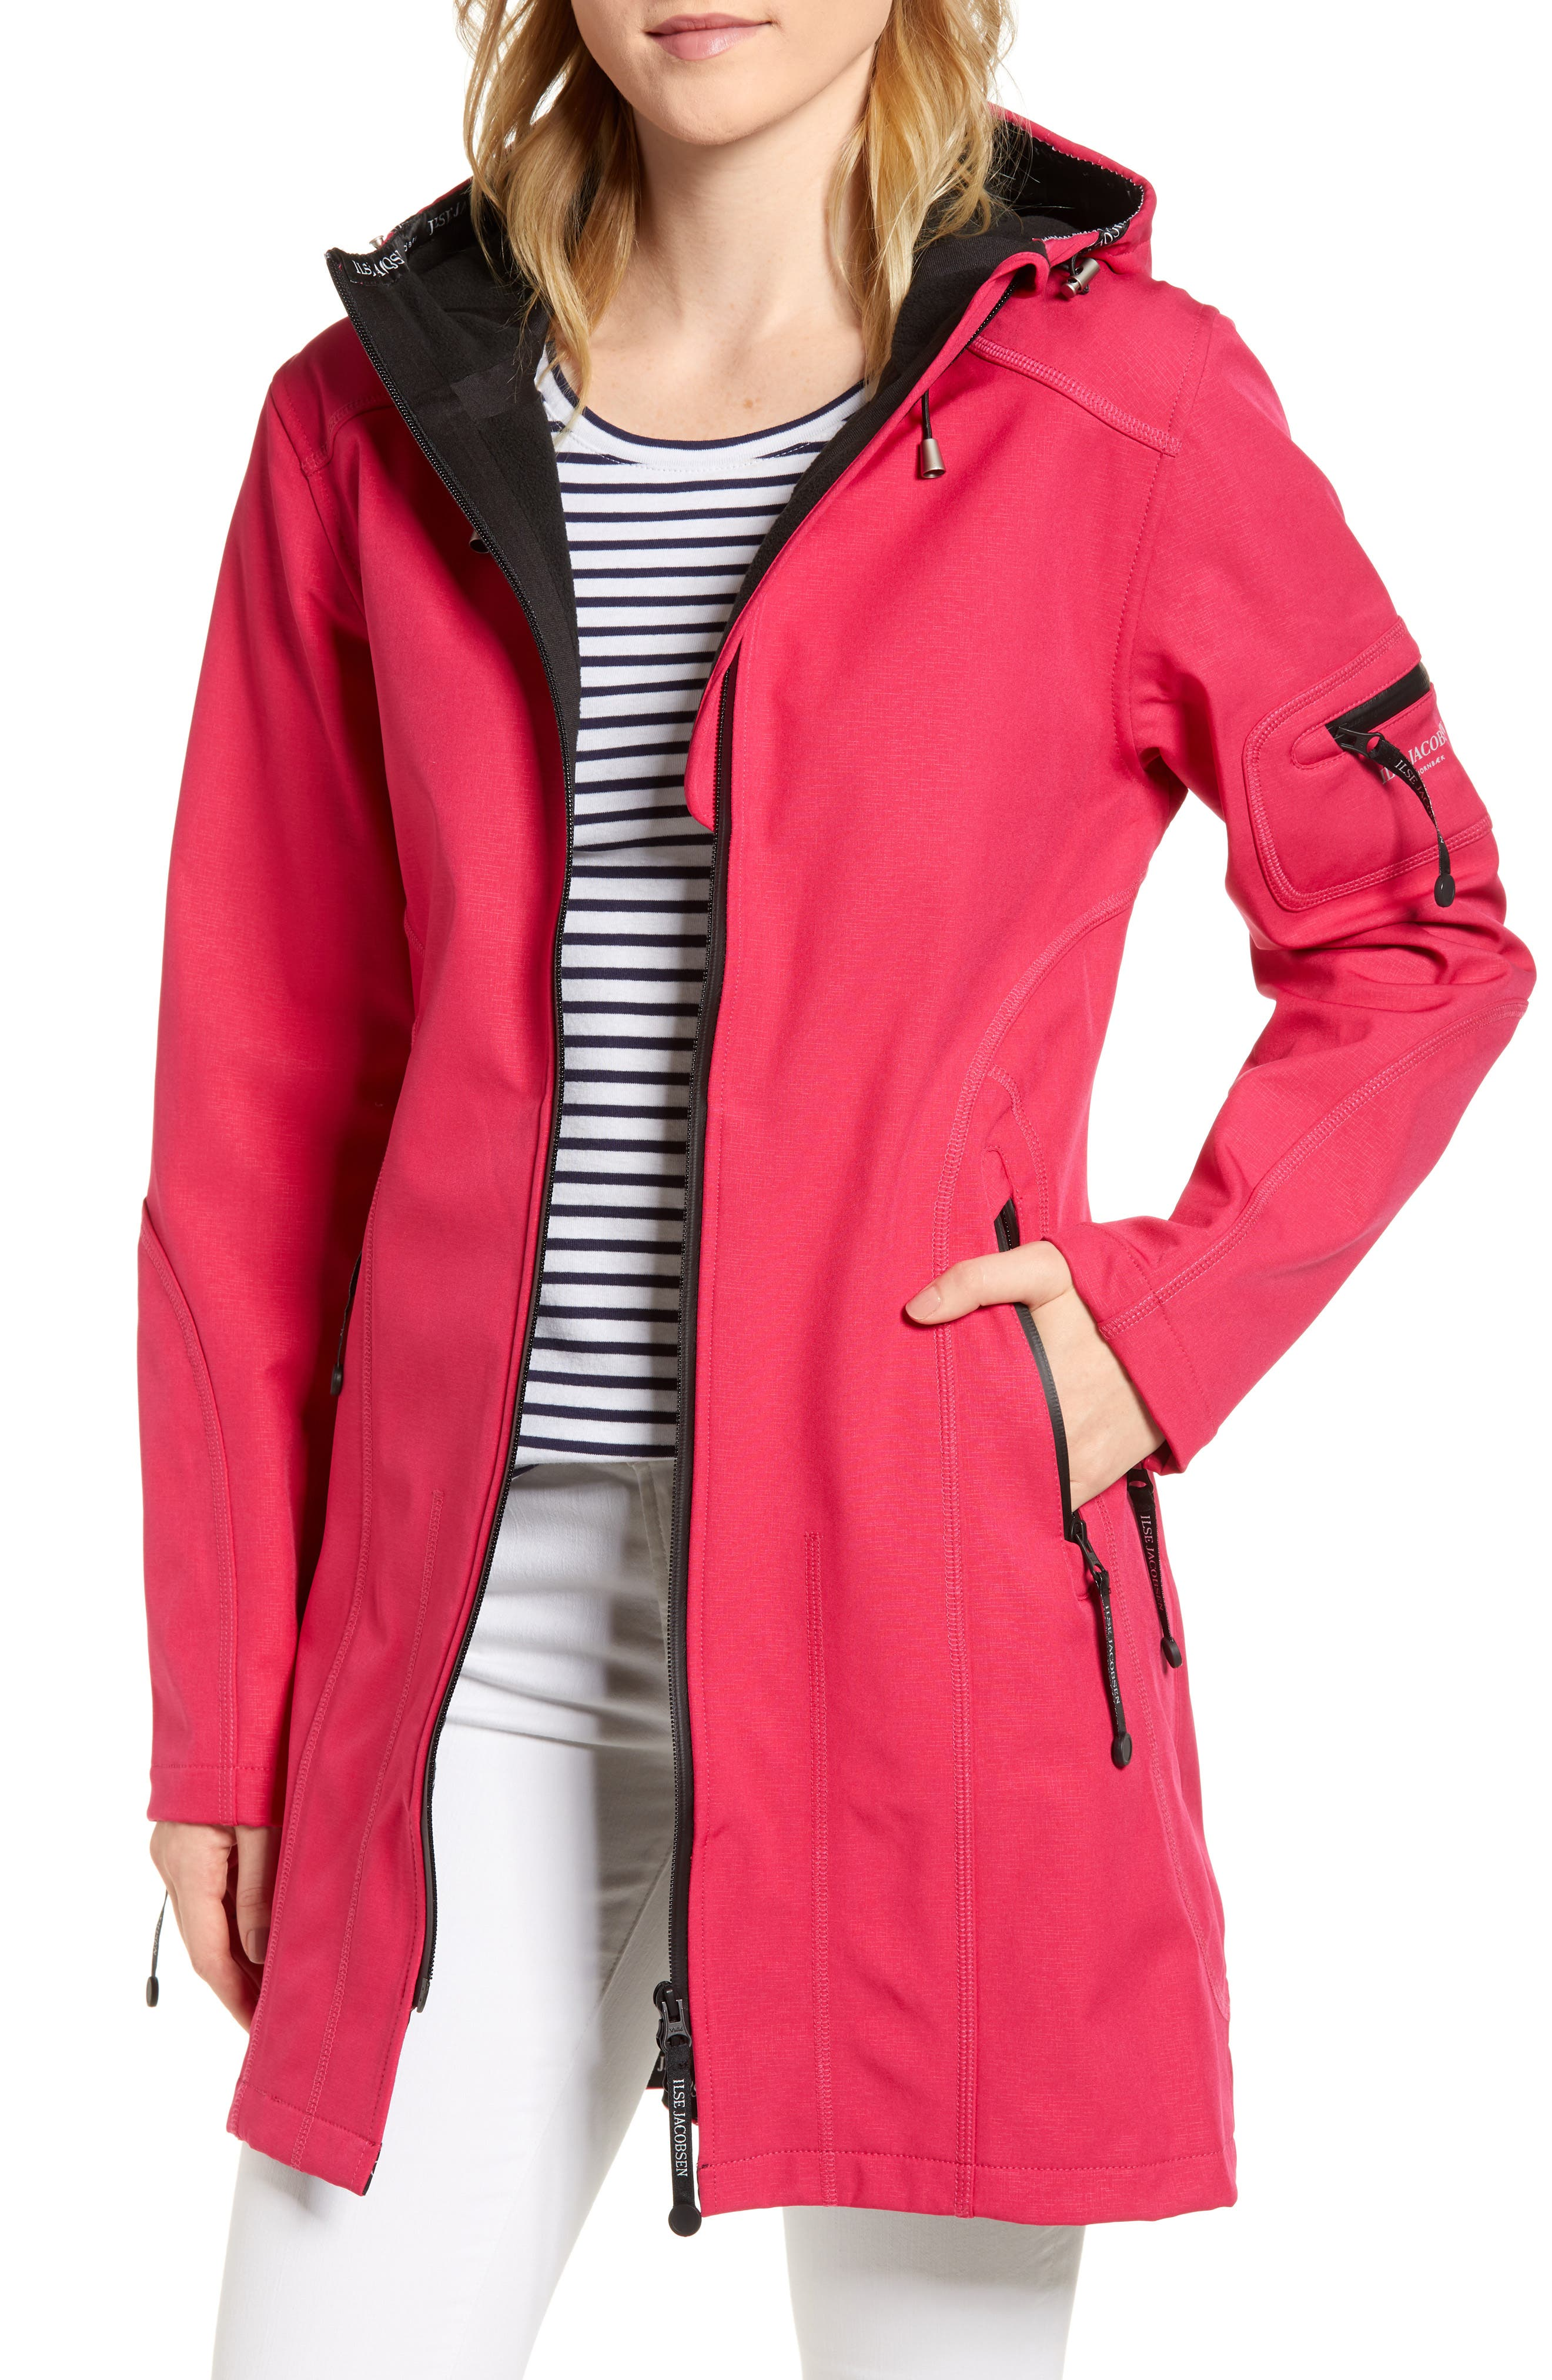 Rain 7 Hooded Water Resistant Coat,                         Main,                         color, Warm Pink